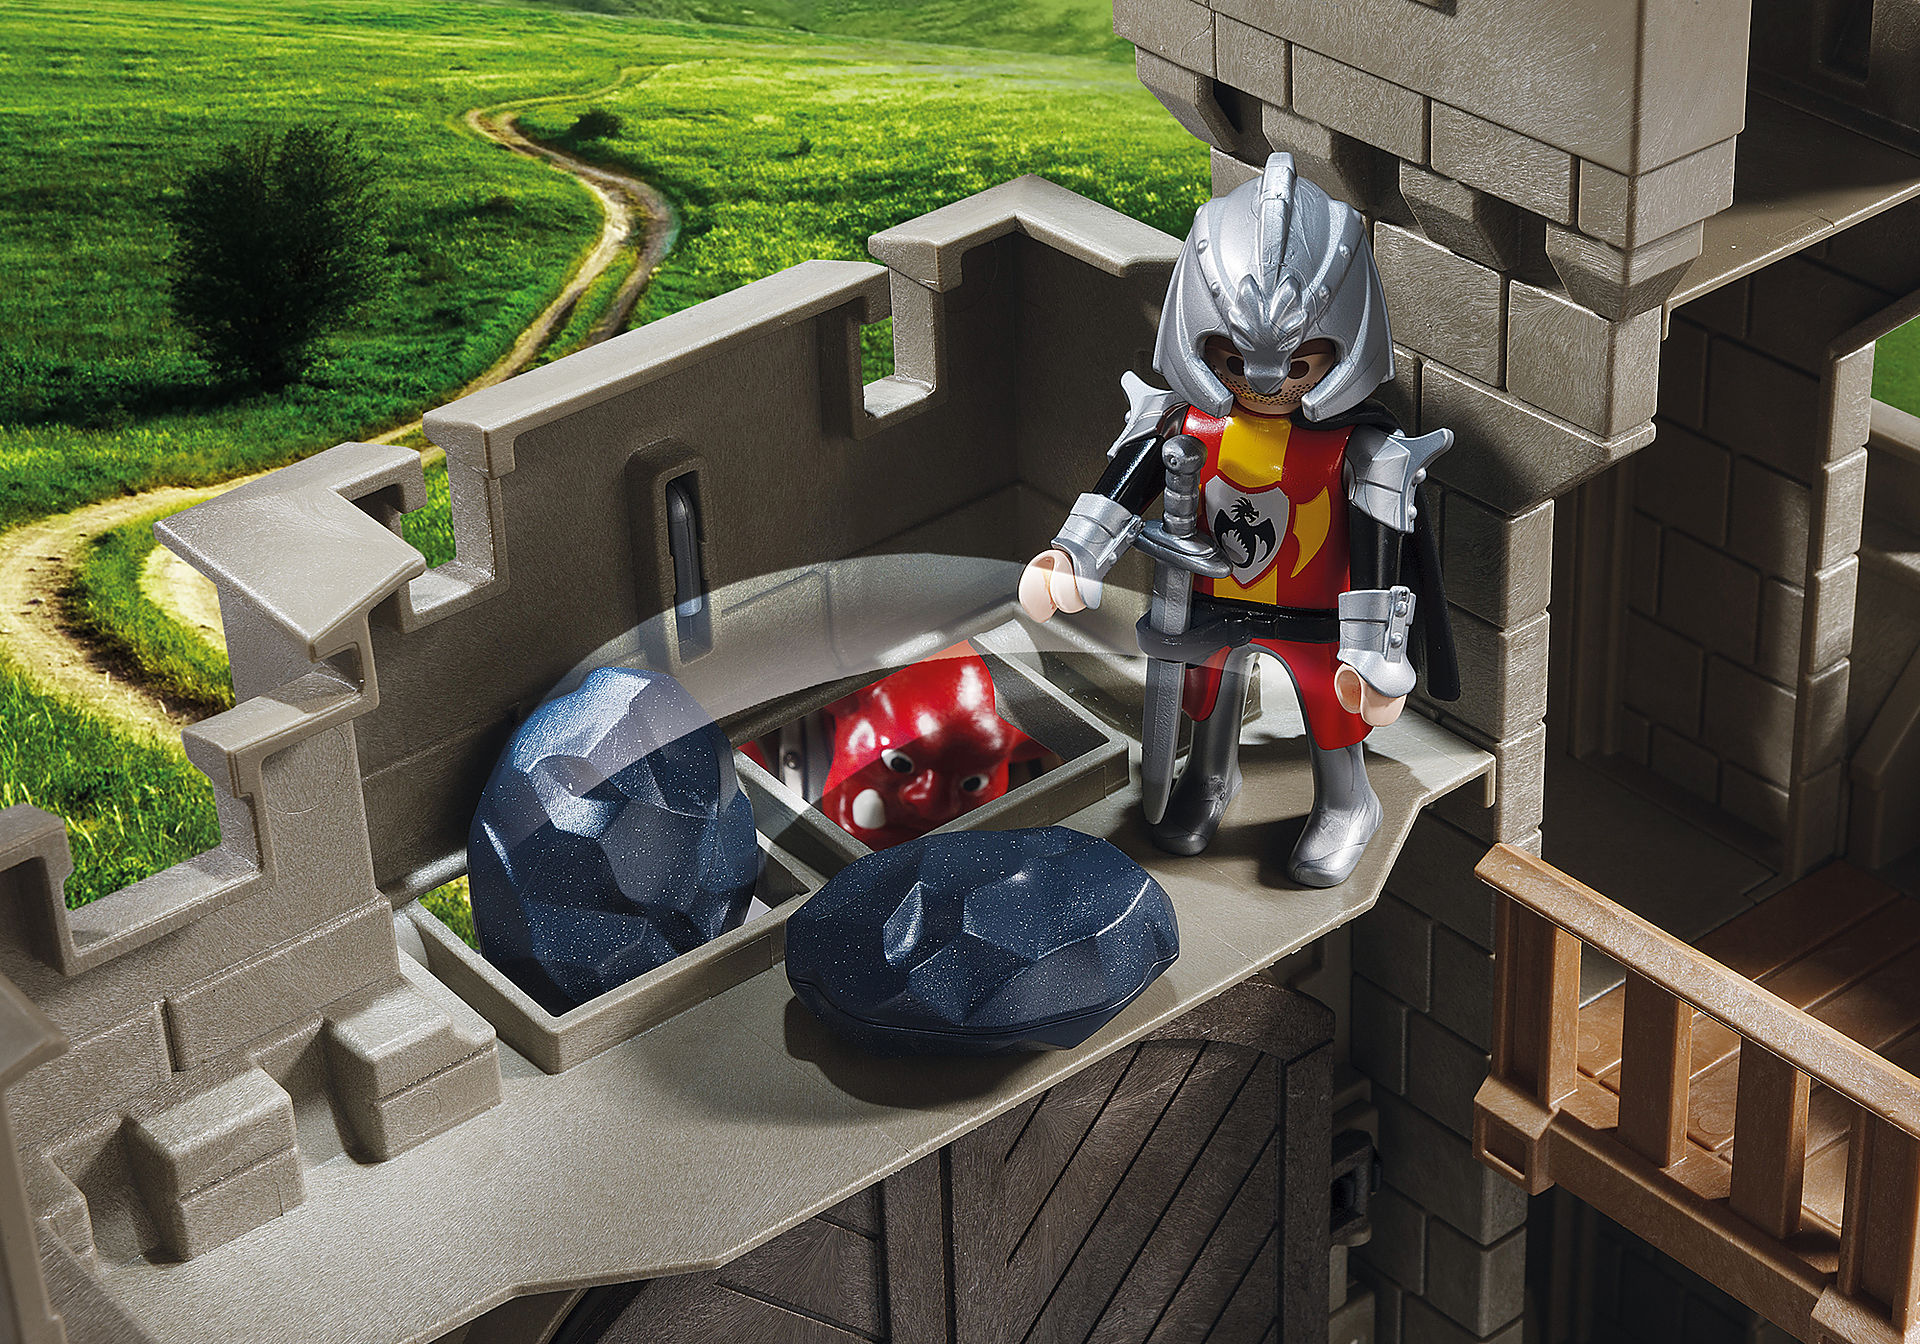 http://media.playmobil.com/i/playmobil/5670_product_extra1/Knights Castle Club Set